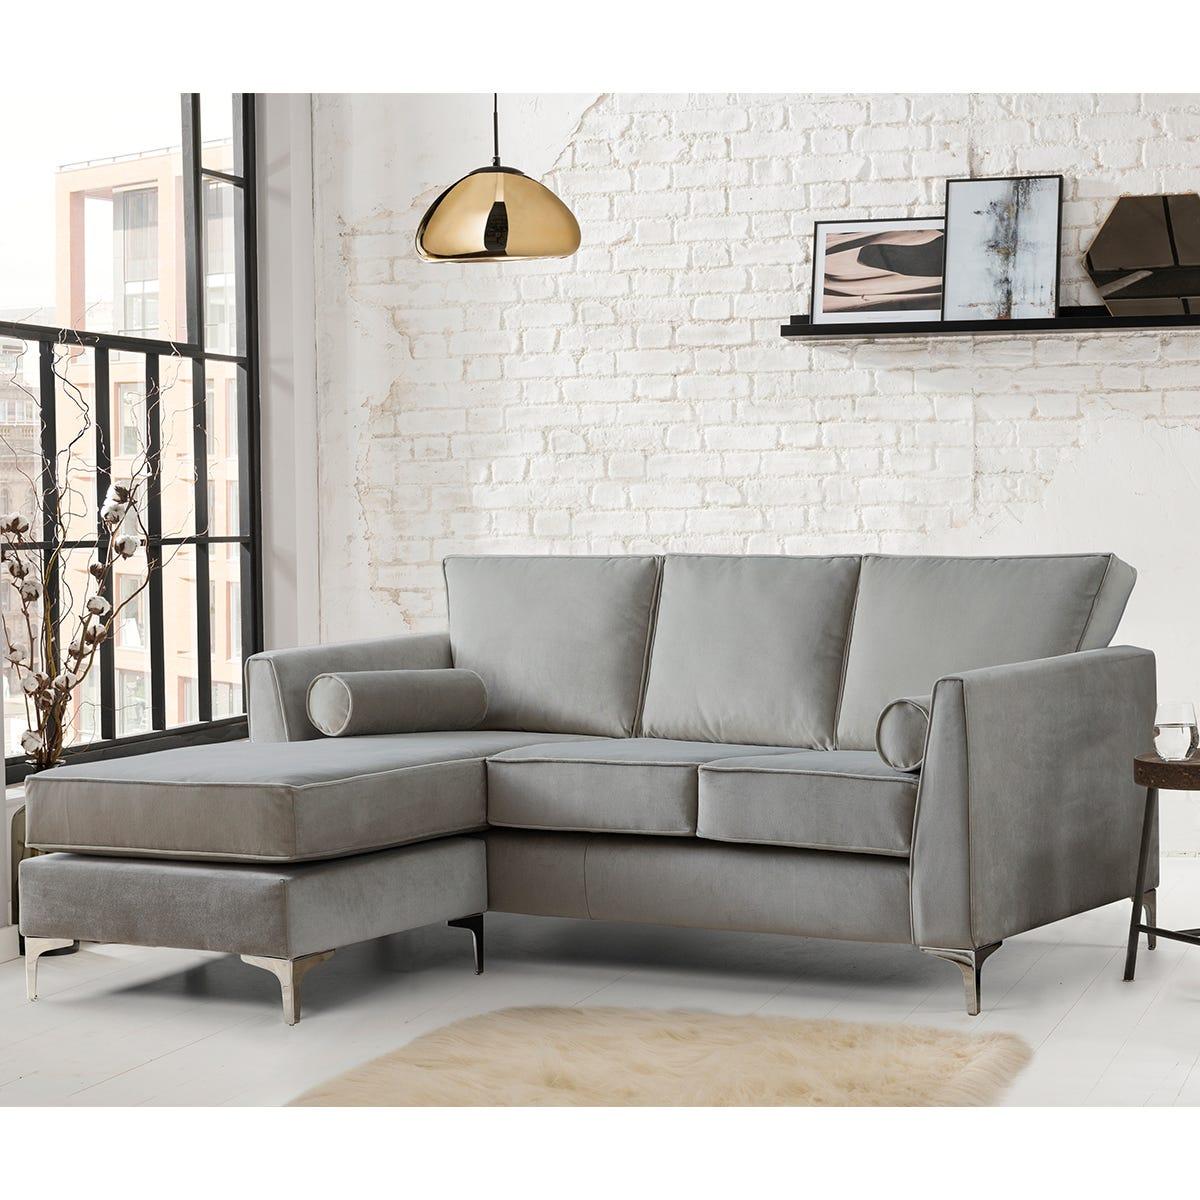 Milan Icon Corner Chaise Sofa Malta Grey